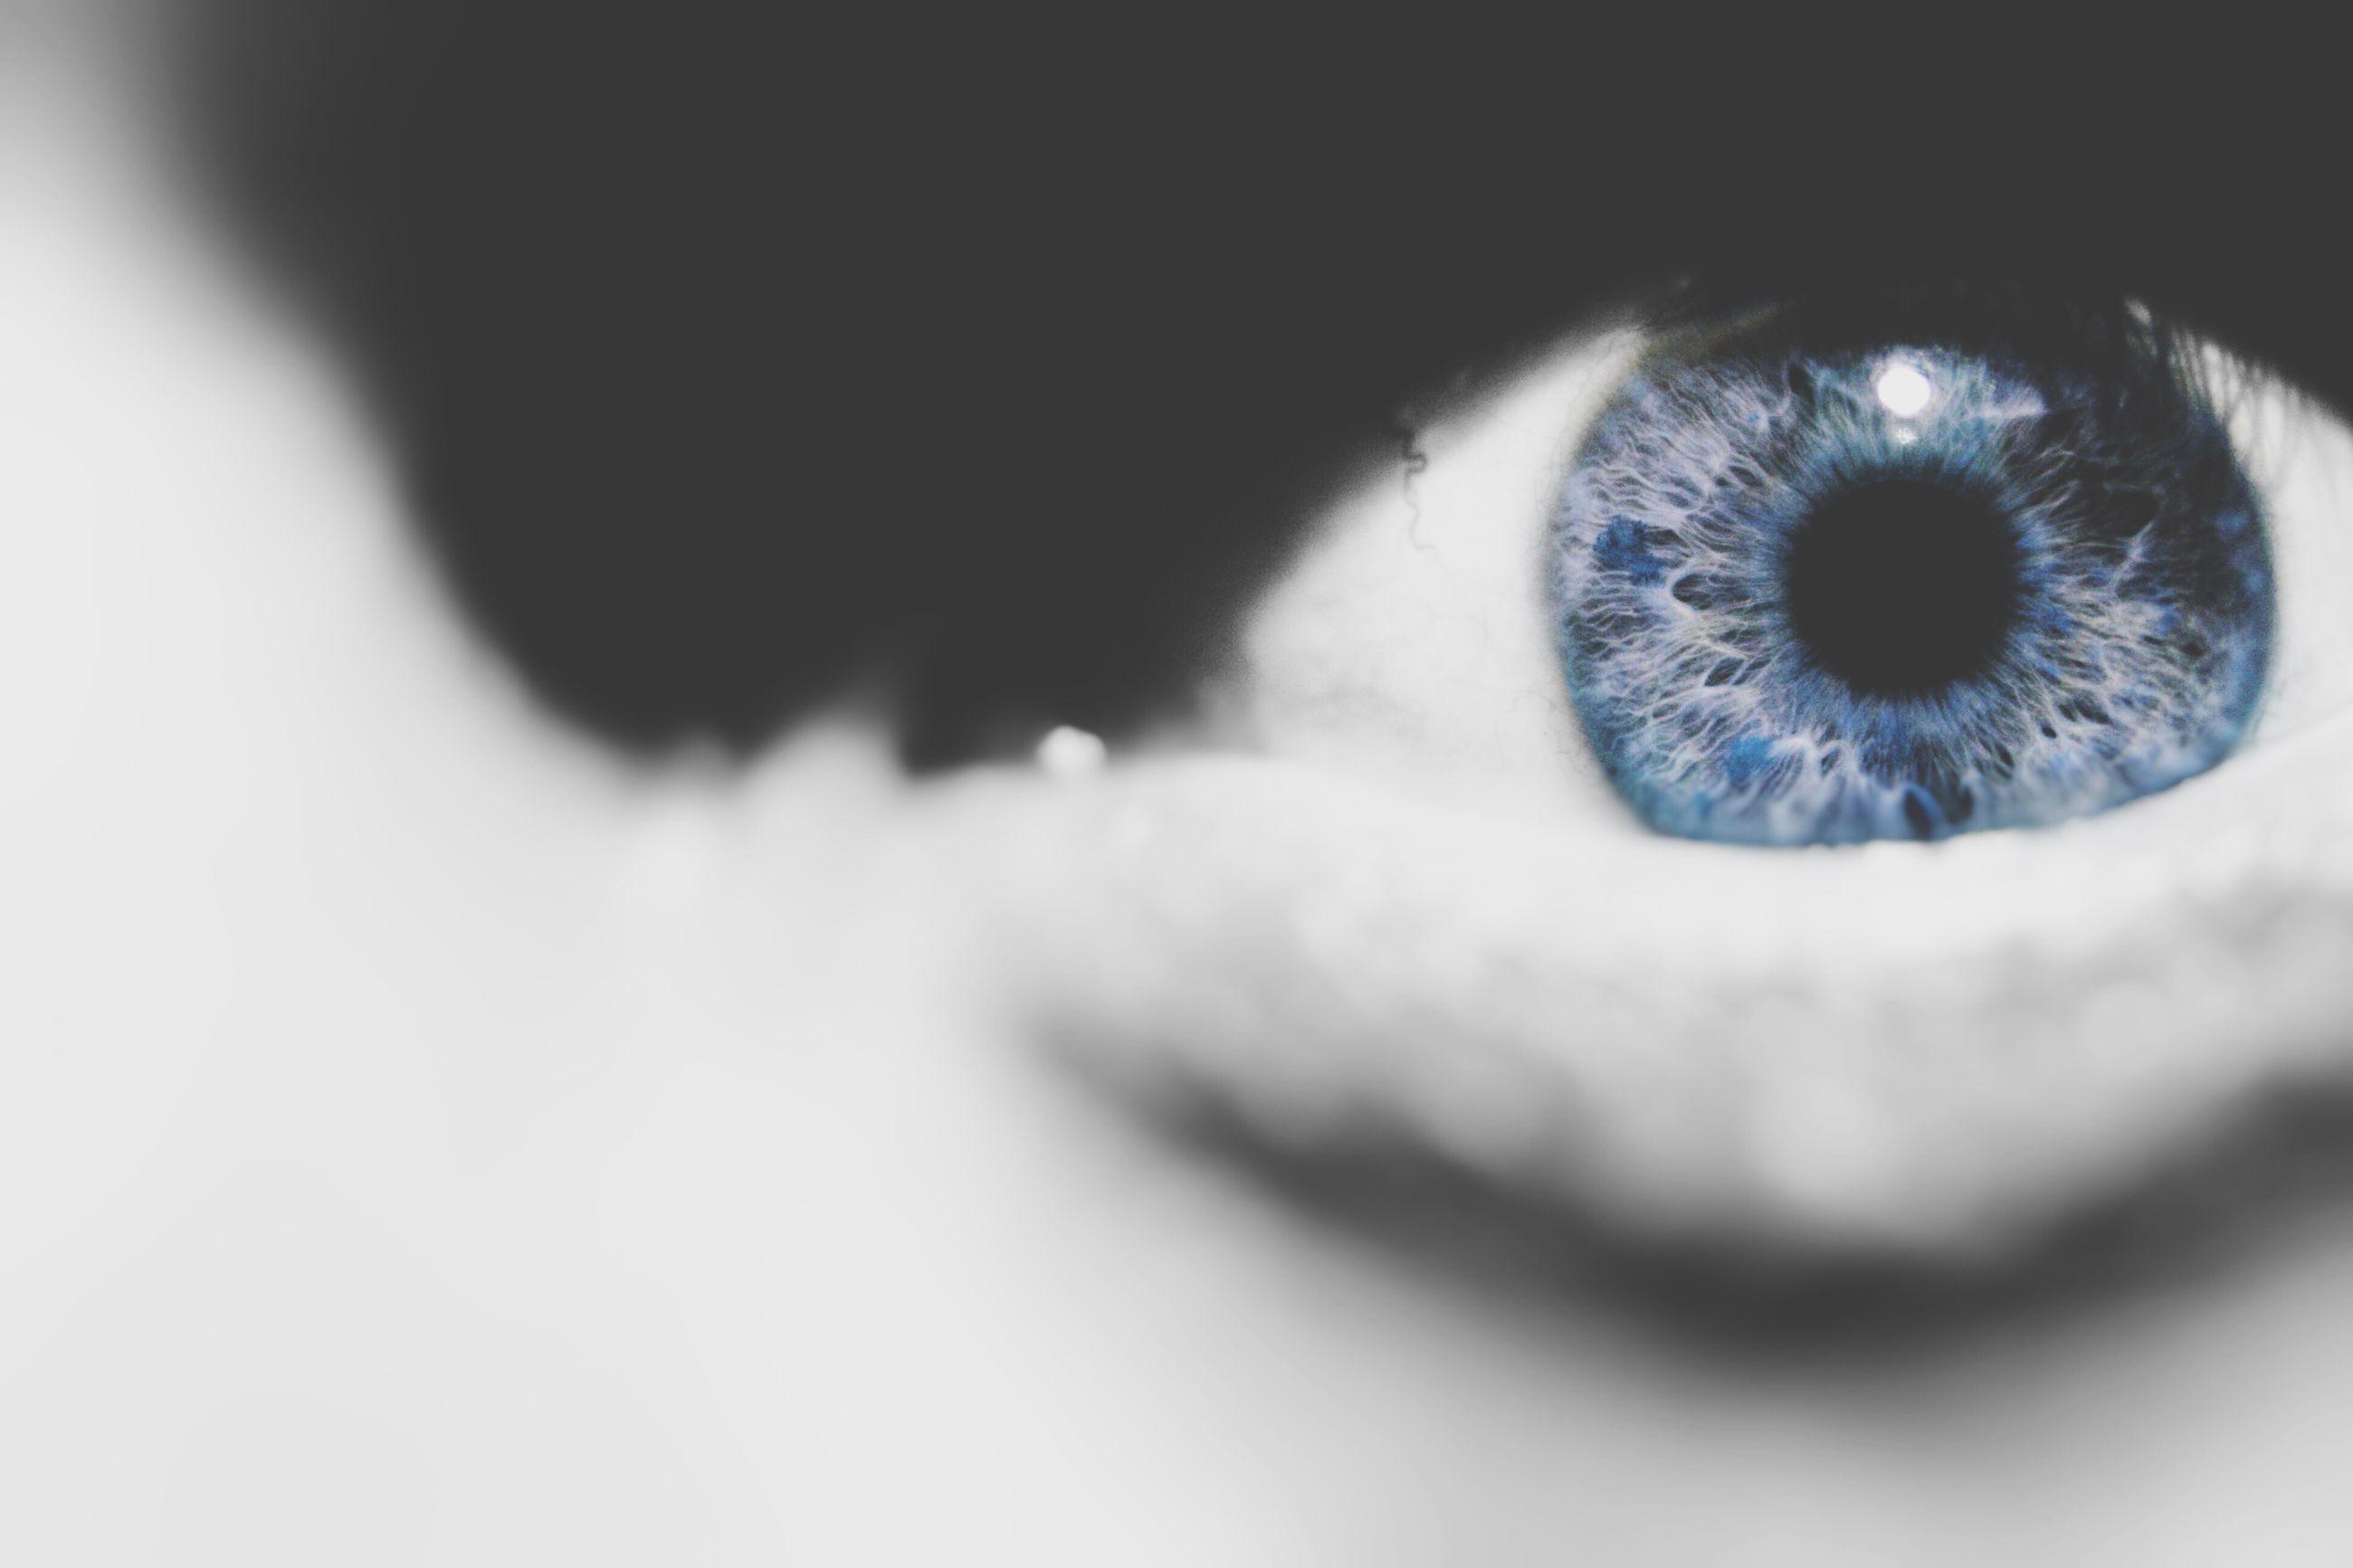 close-up, indoors, part of, selective focus, human eye, one animal, studio shot, pets, extreme close-up, eyesight, detail, extreme close up, sensory perception, looking at camera, eyelash, cropped, unrecognizable person